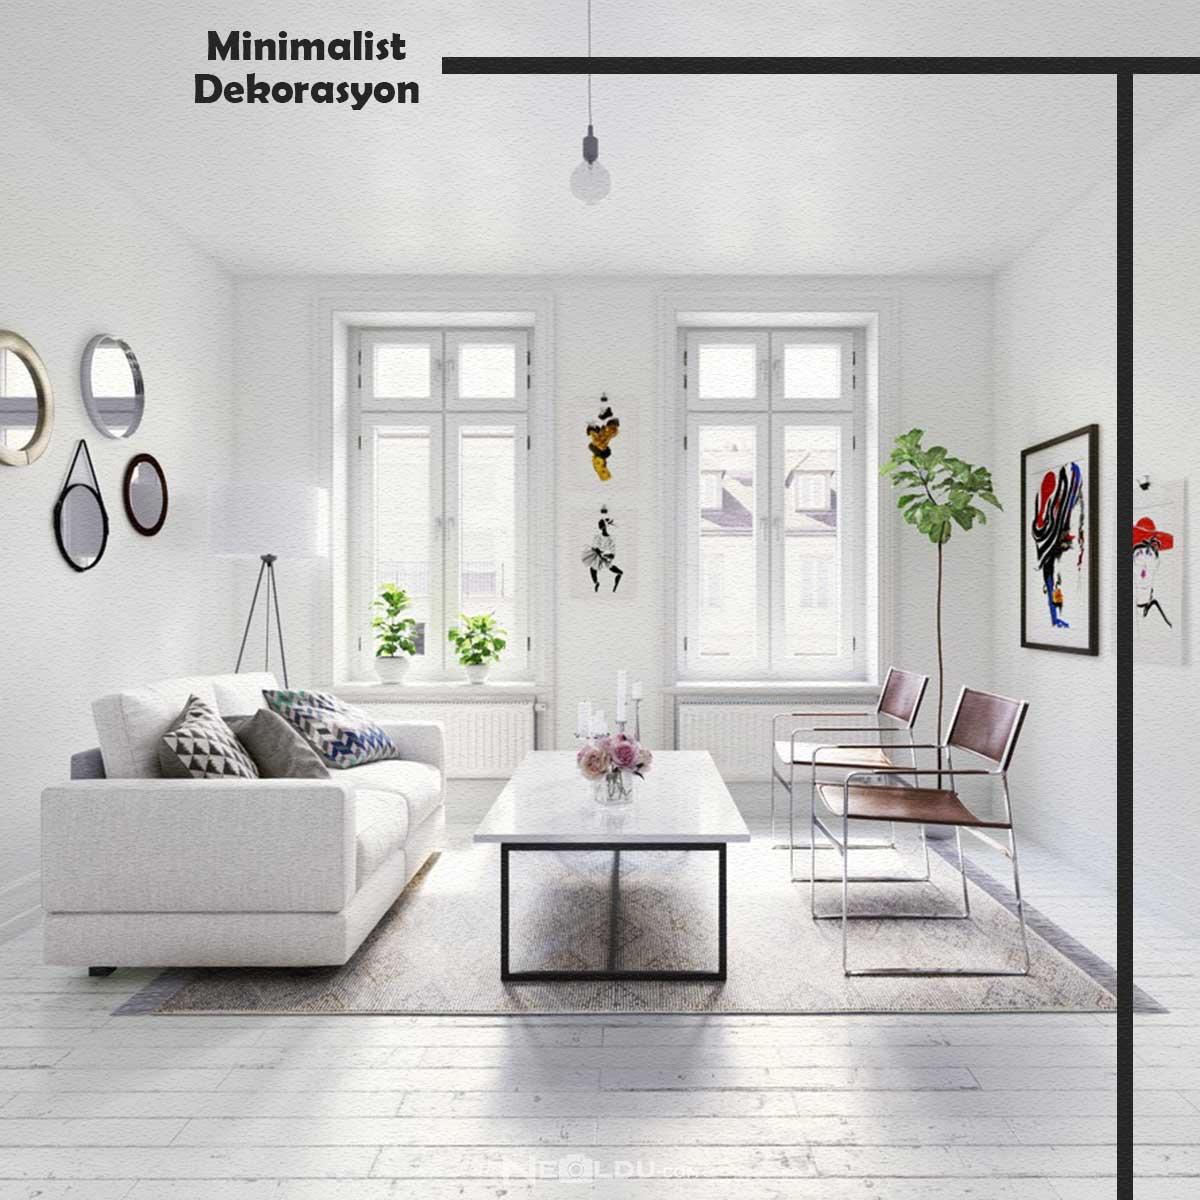 minimalist-dekorasyon-014.jpg